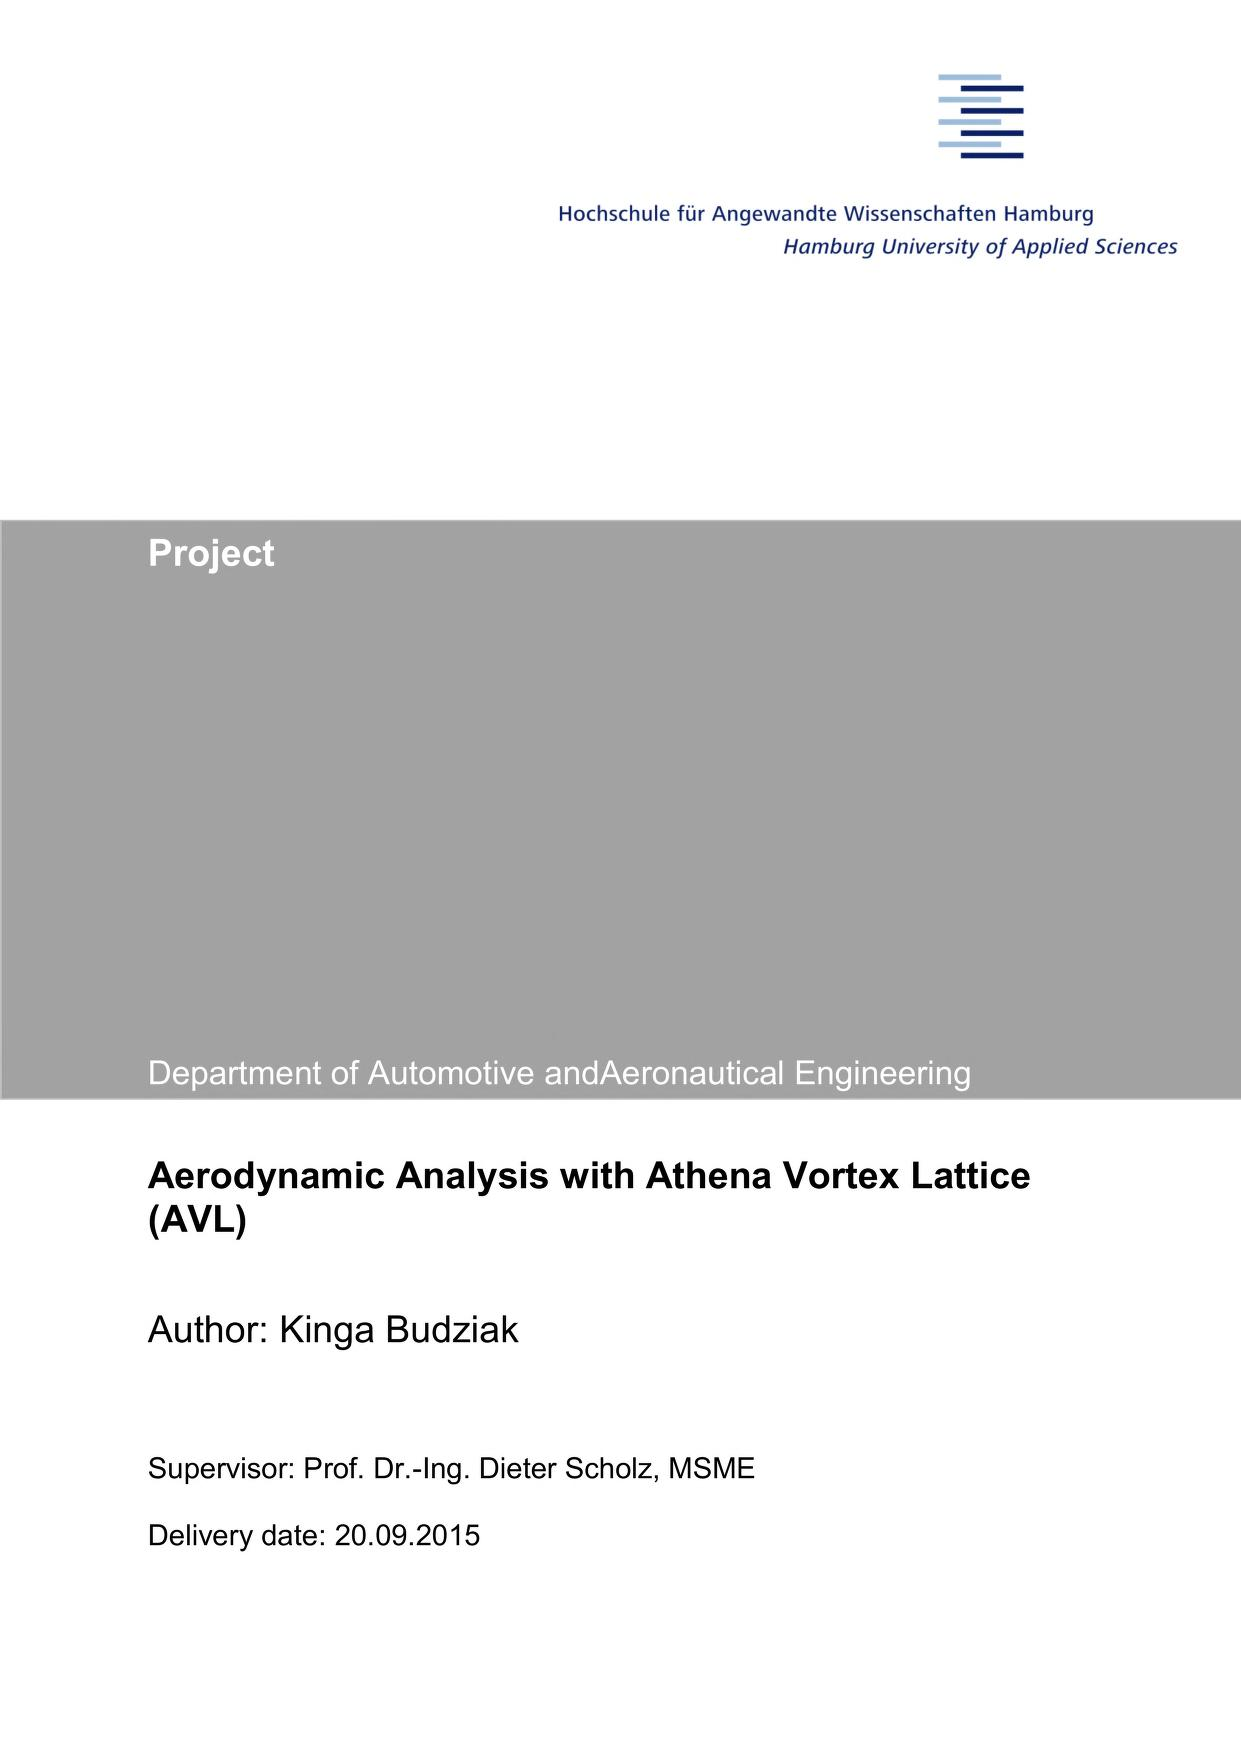 Thumbnail image ofAerodynamic Analysis with Athena Vortex Lattice...